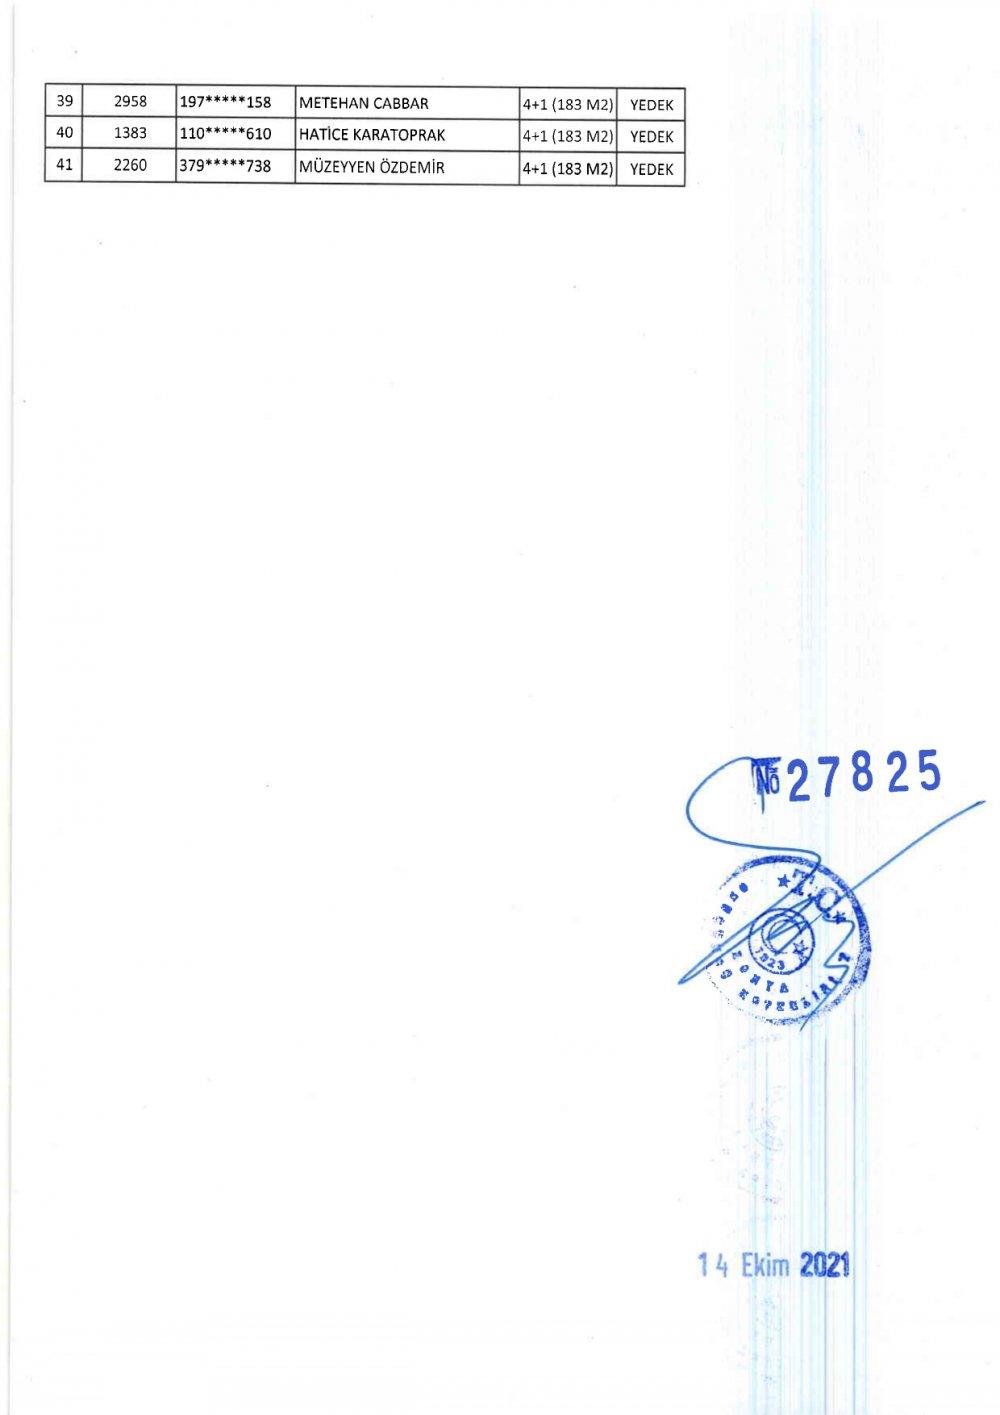 ss-turgutreis-evleri-kyk-kura-cekilis-listesi-page-0022.jpg